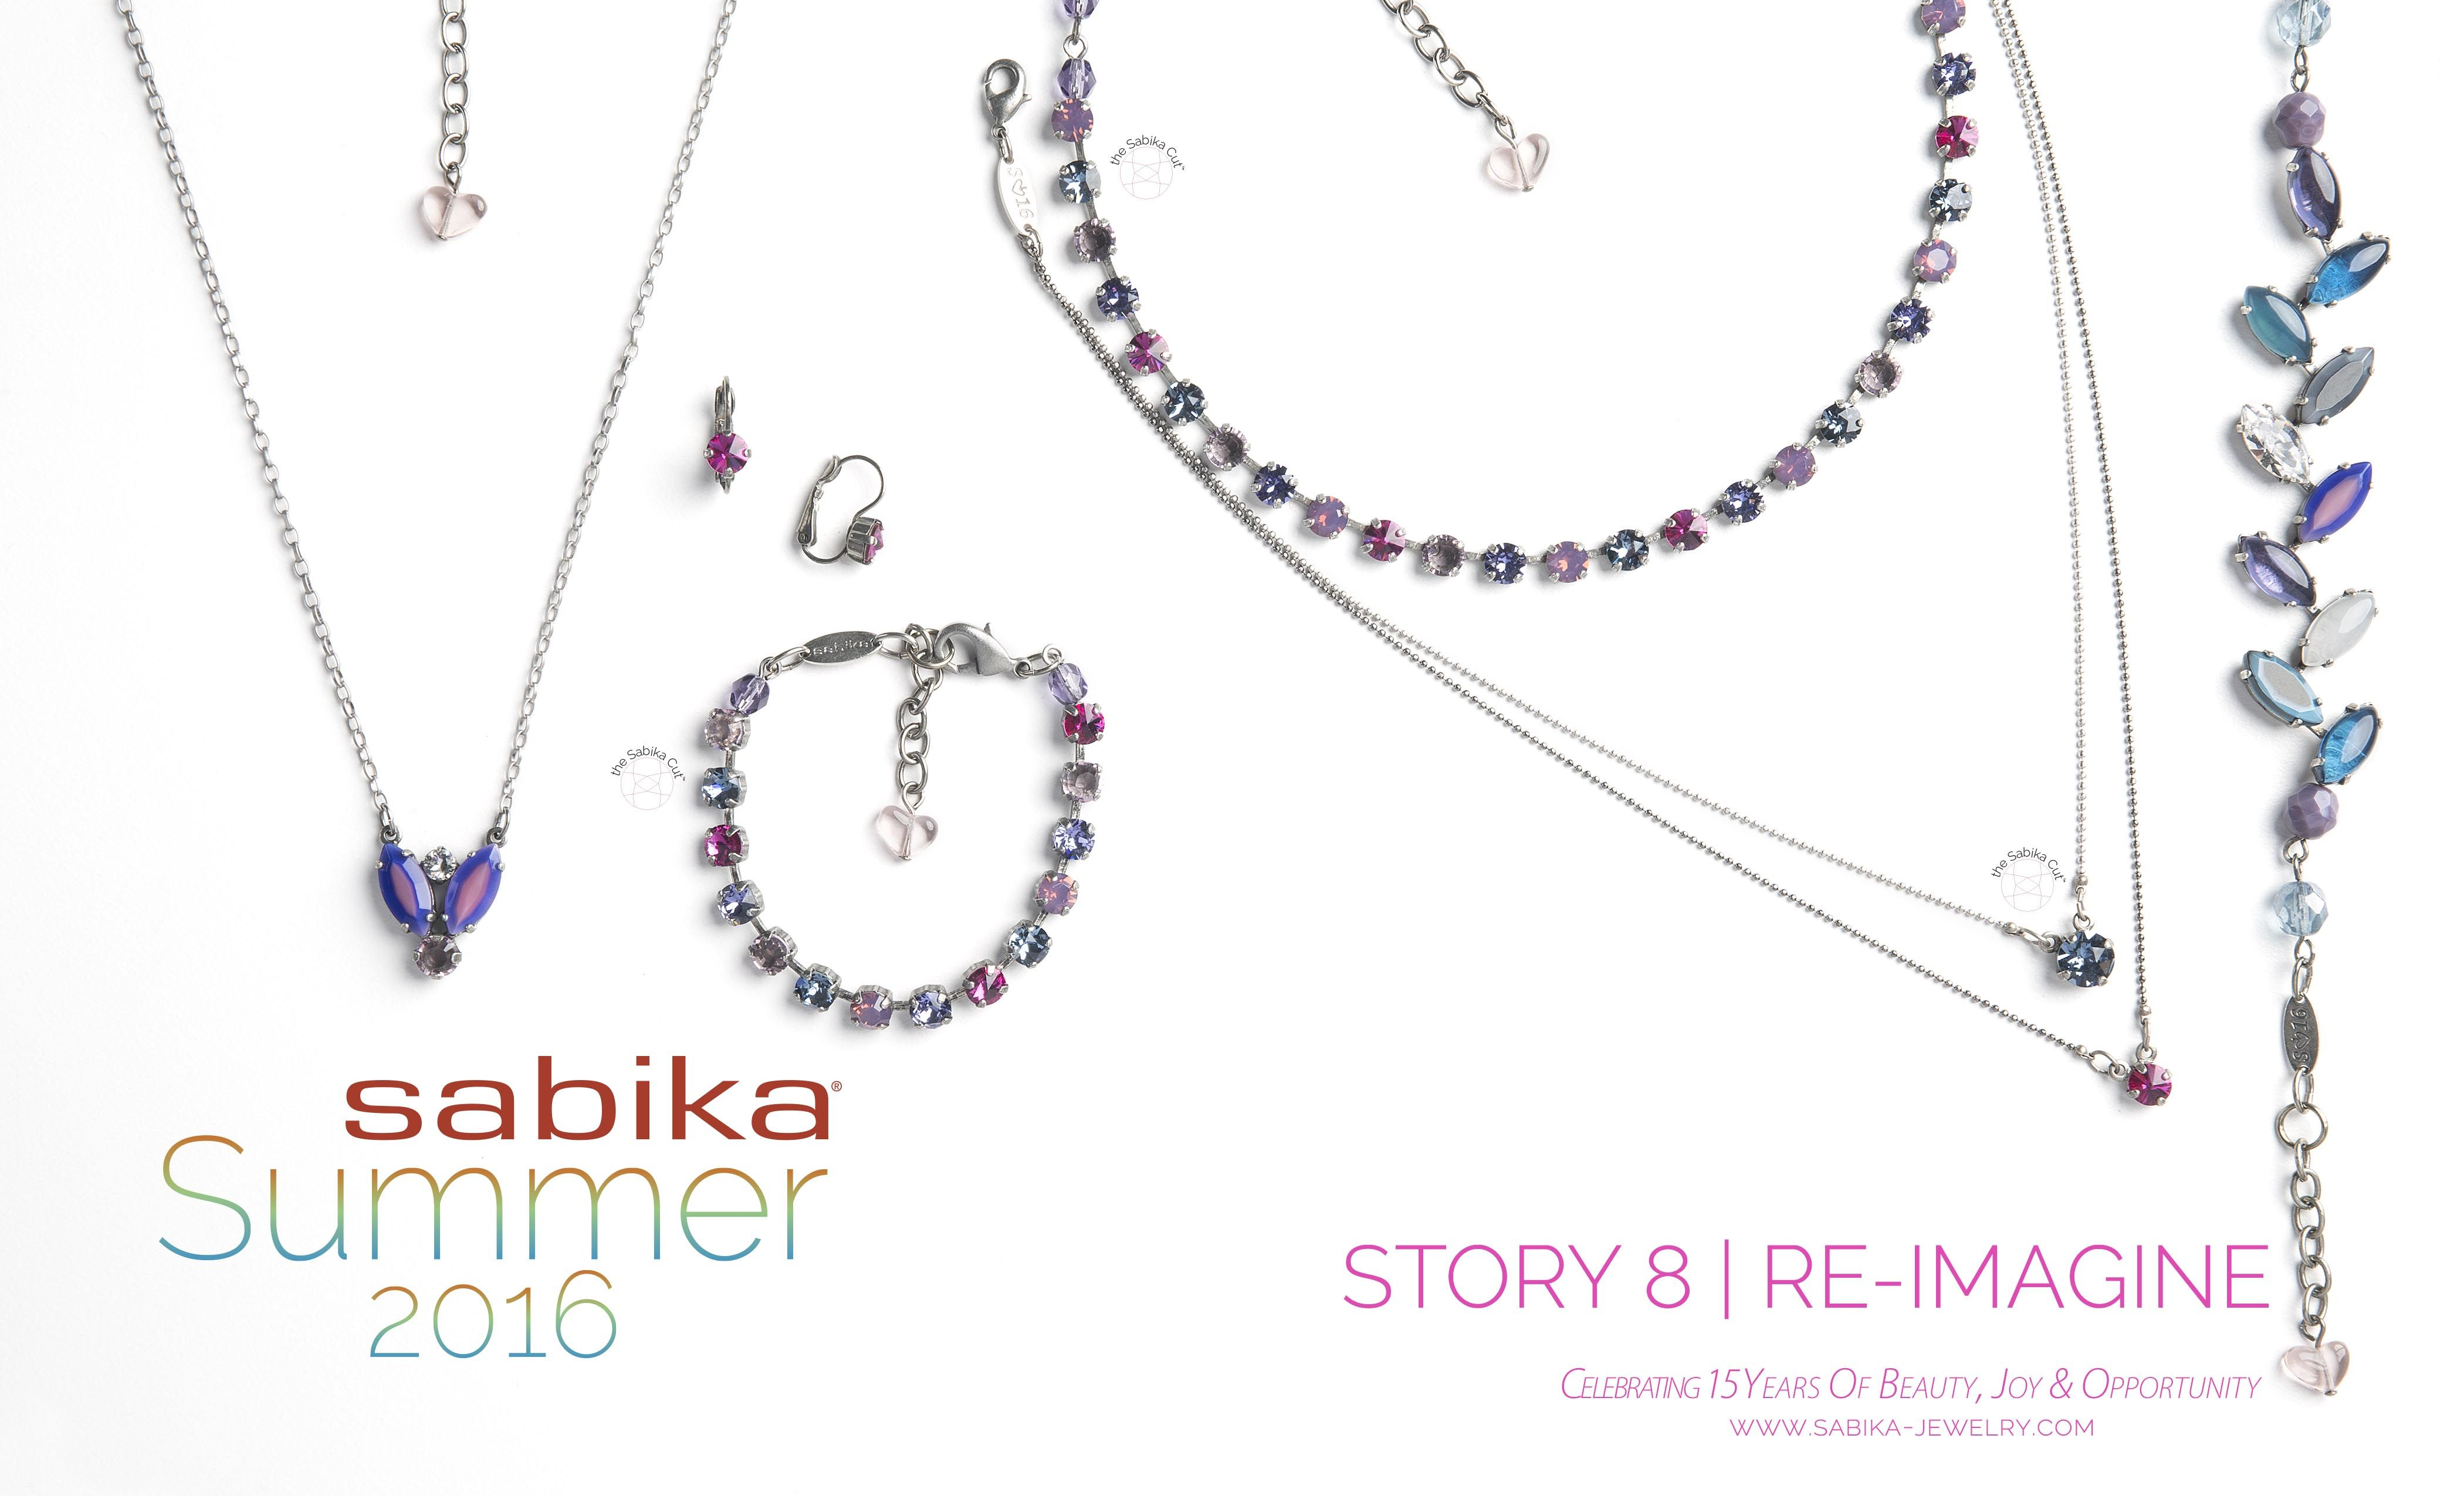 Sabika look necklace - Sabika Spring Summer 2016 Collection Story 8 Re Imagine